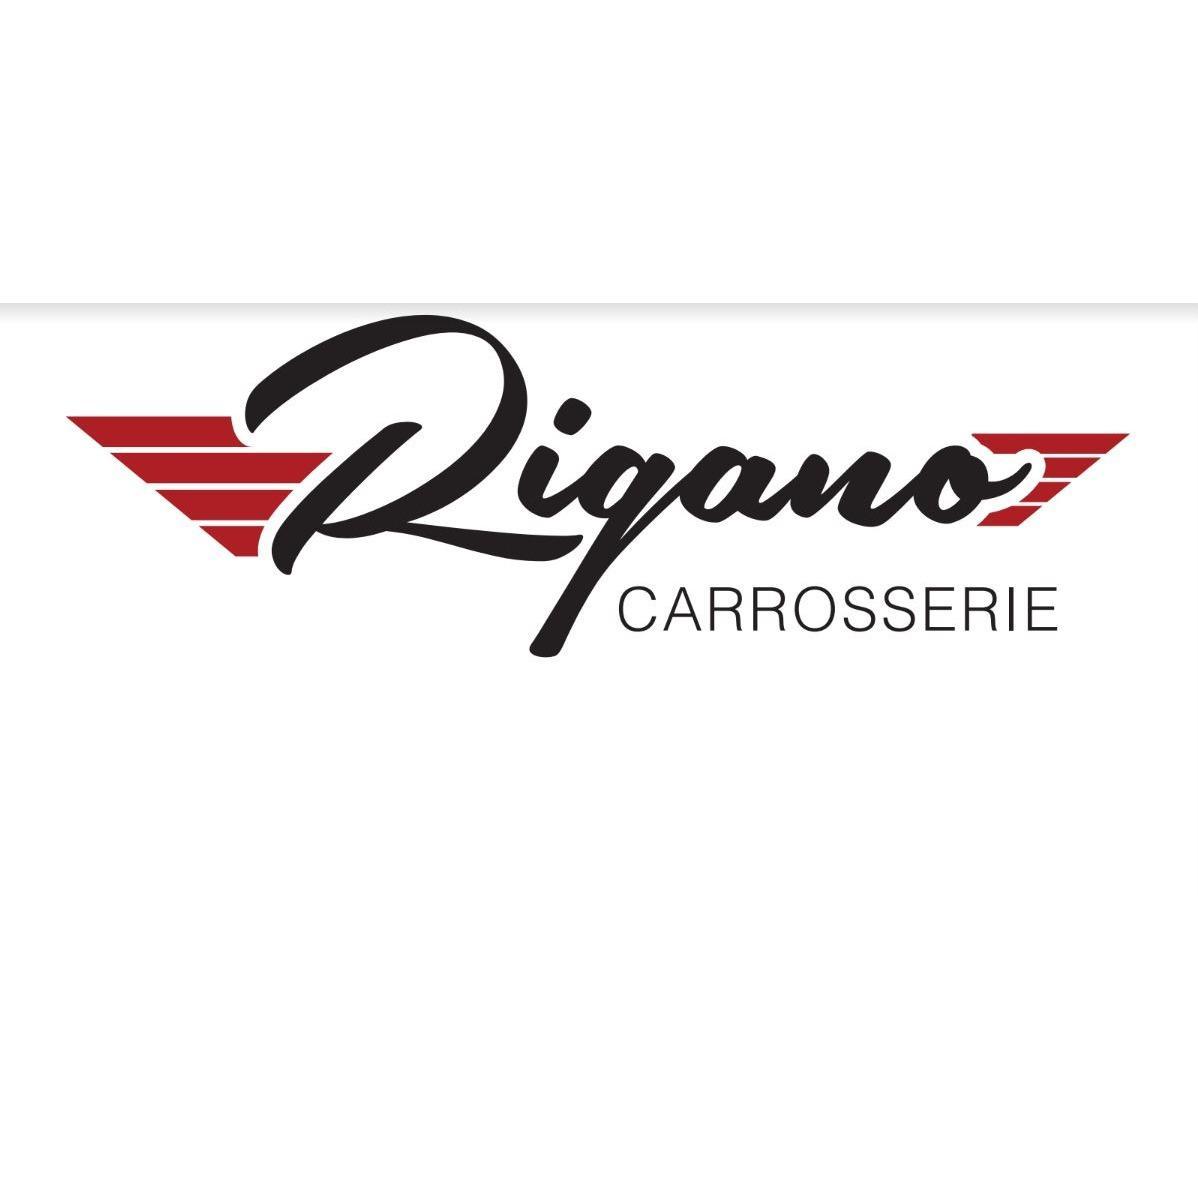 Carrosserie Rigano Carrosserie Et Peinture Automobile Jumet